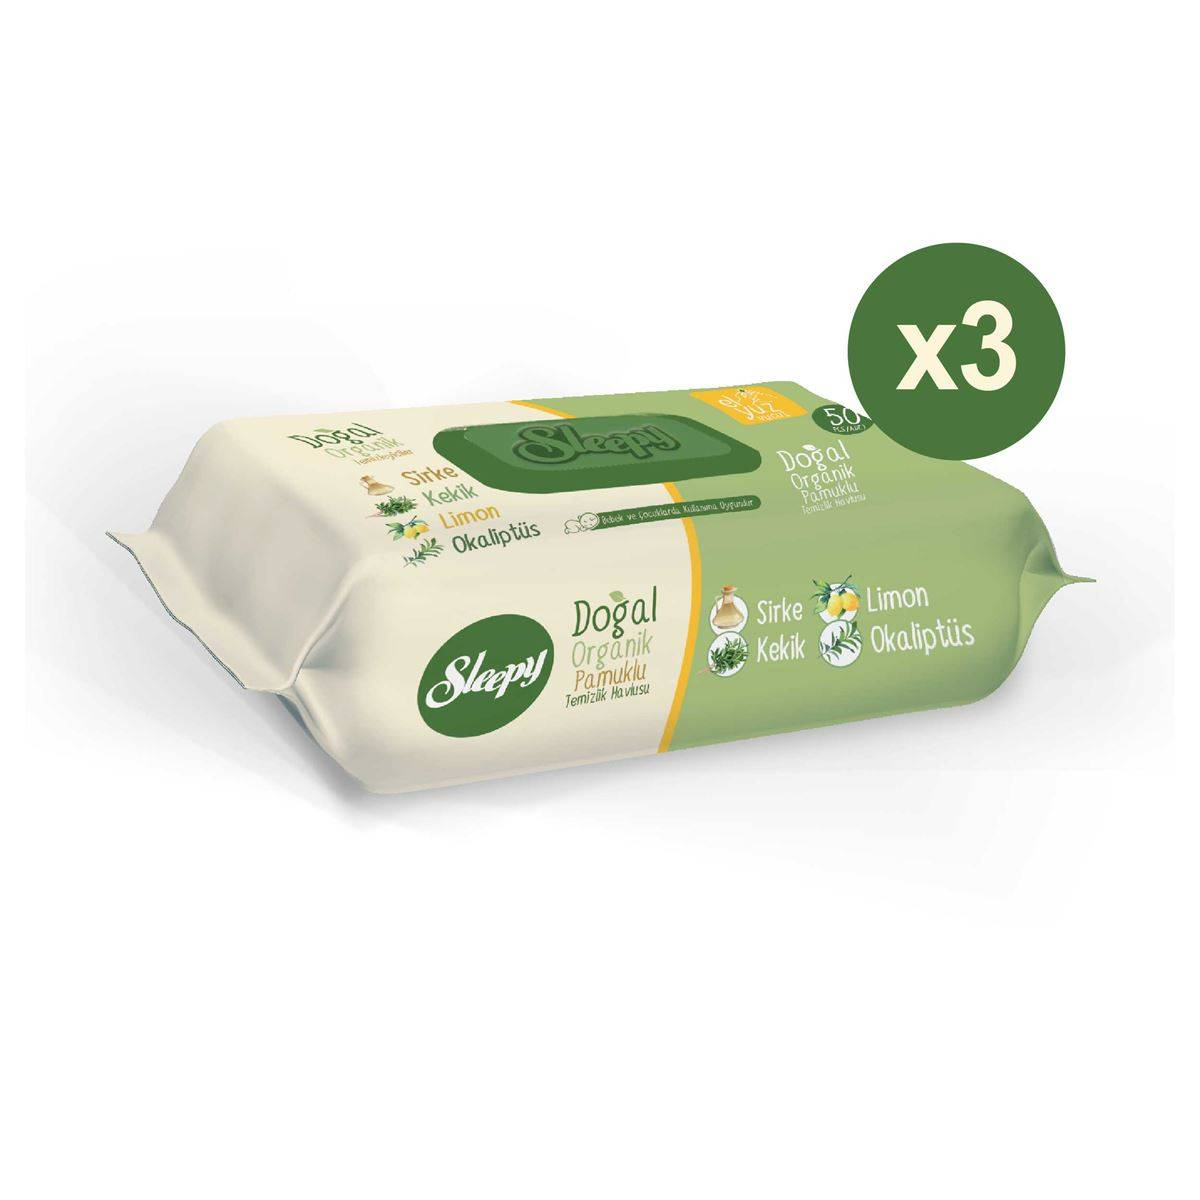 Sleepy Doğal Organik Pamuklu Temizlik Havlusu 3x50